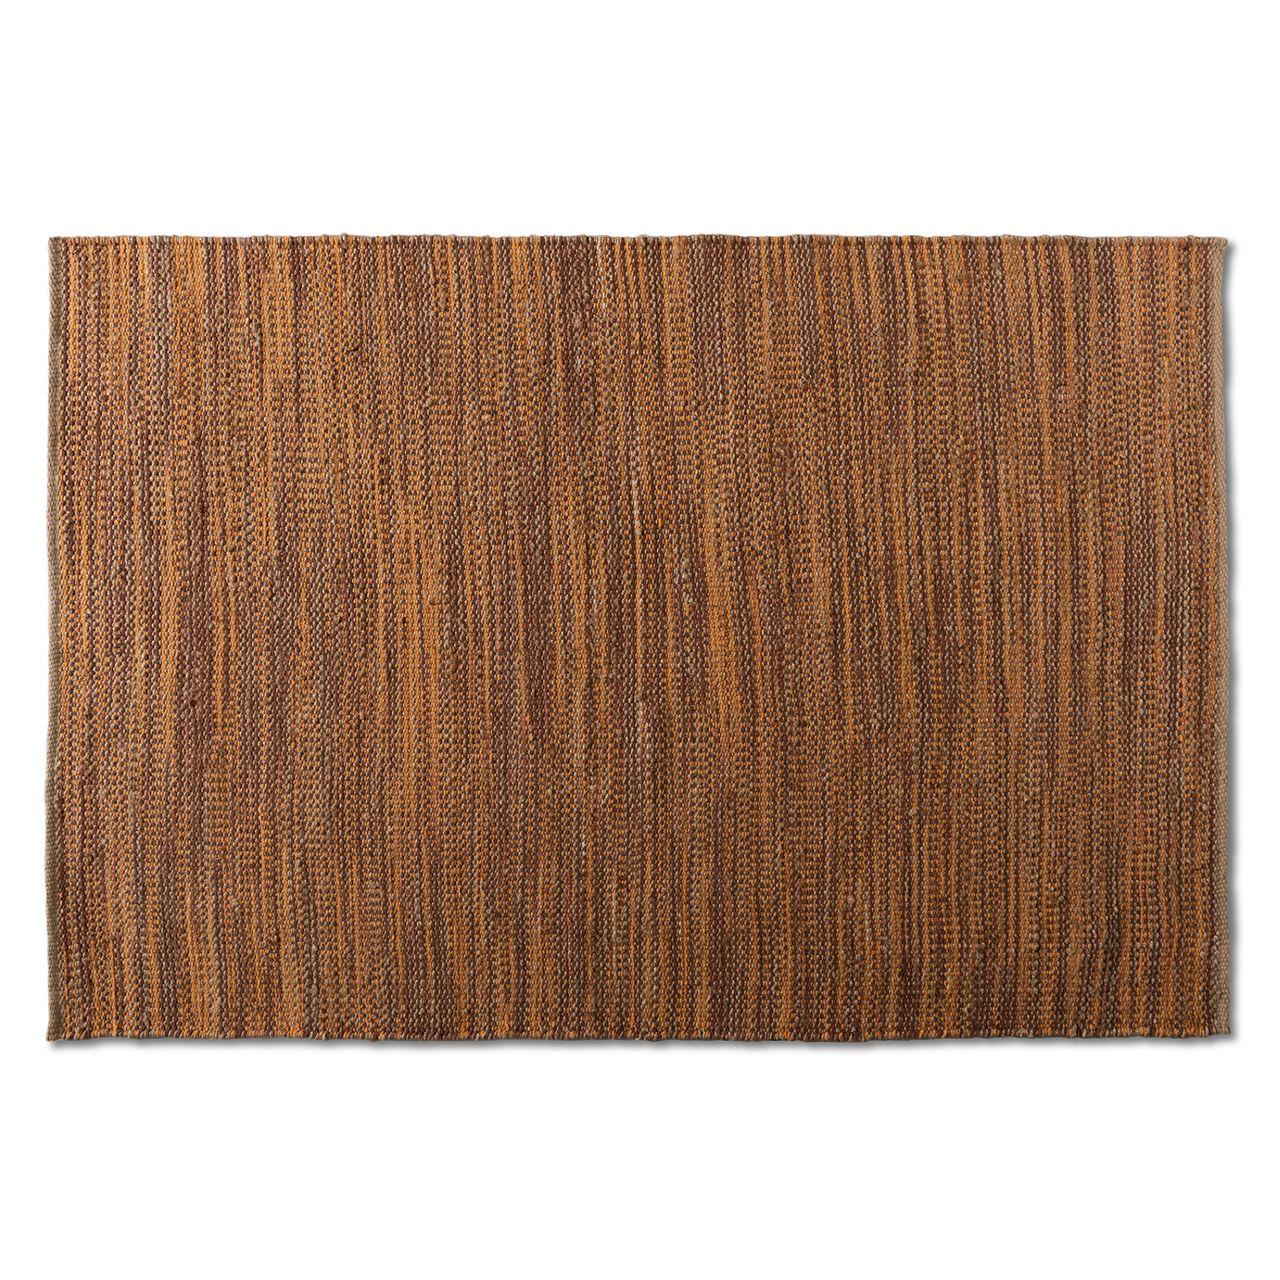 Baxton Studio Michigan Rust Handwoven Hemp Blend Area Rug